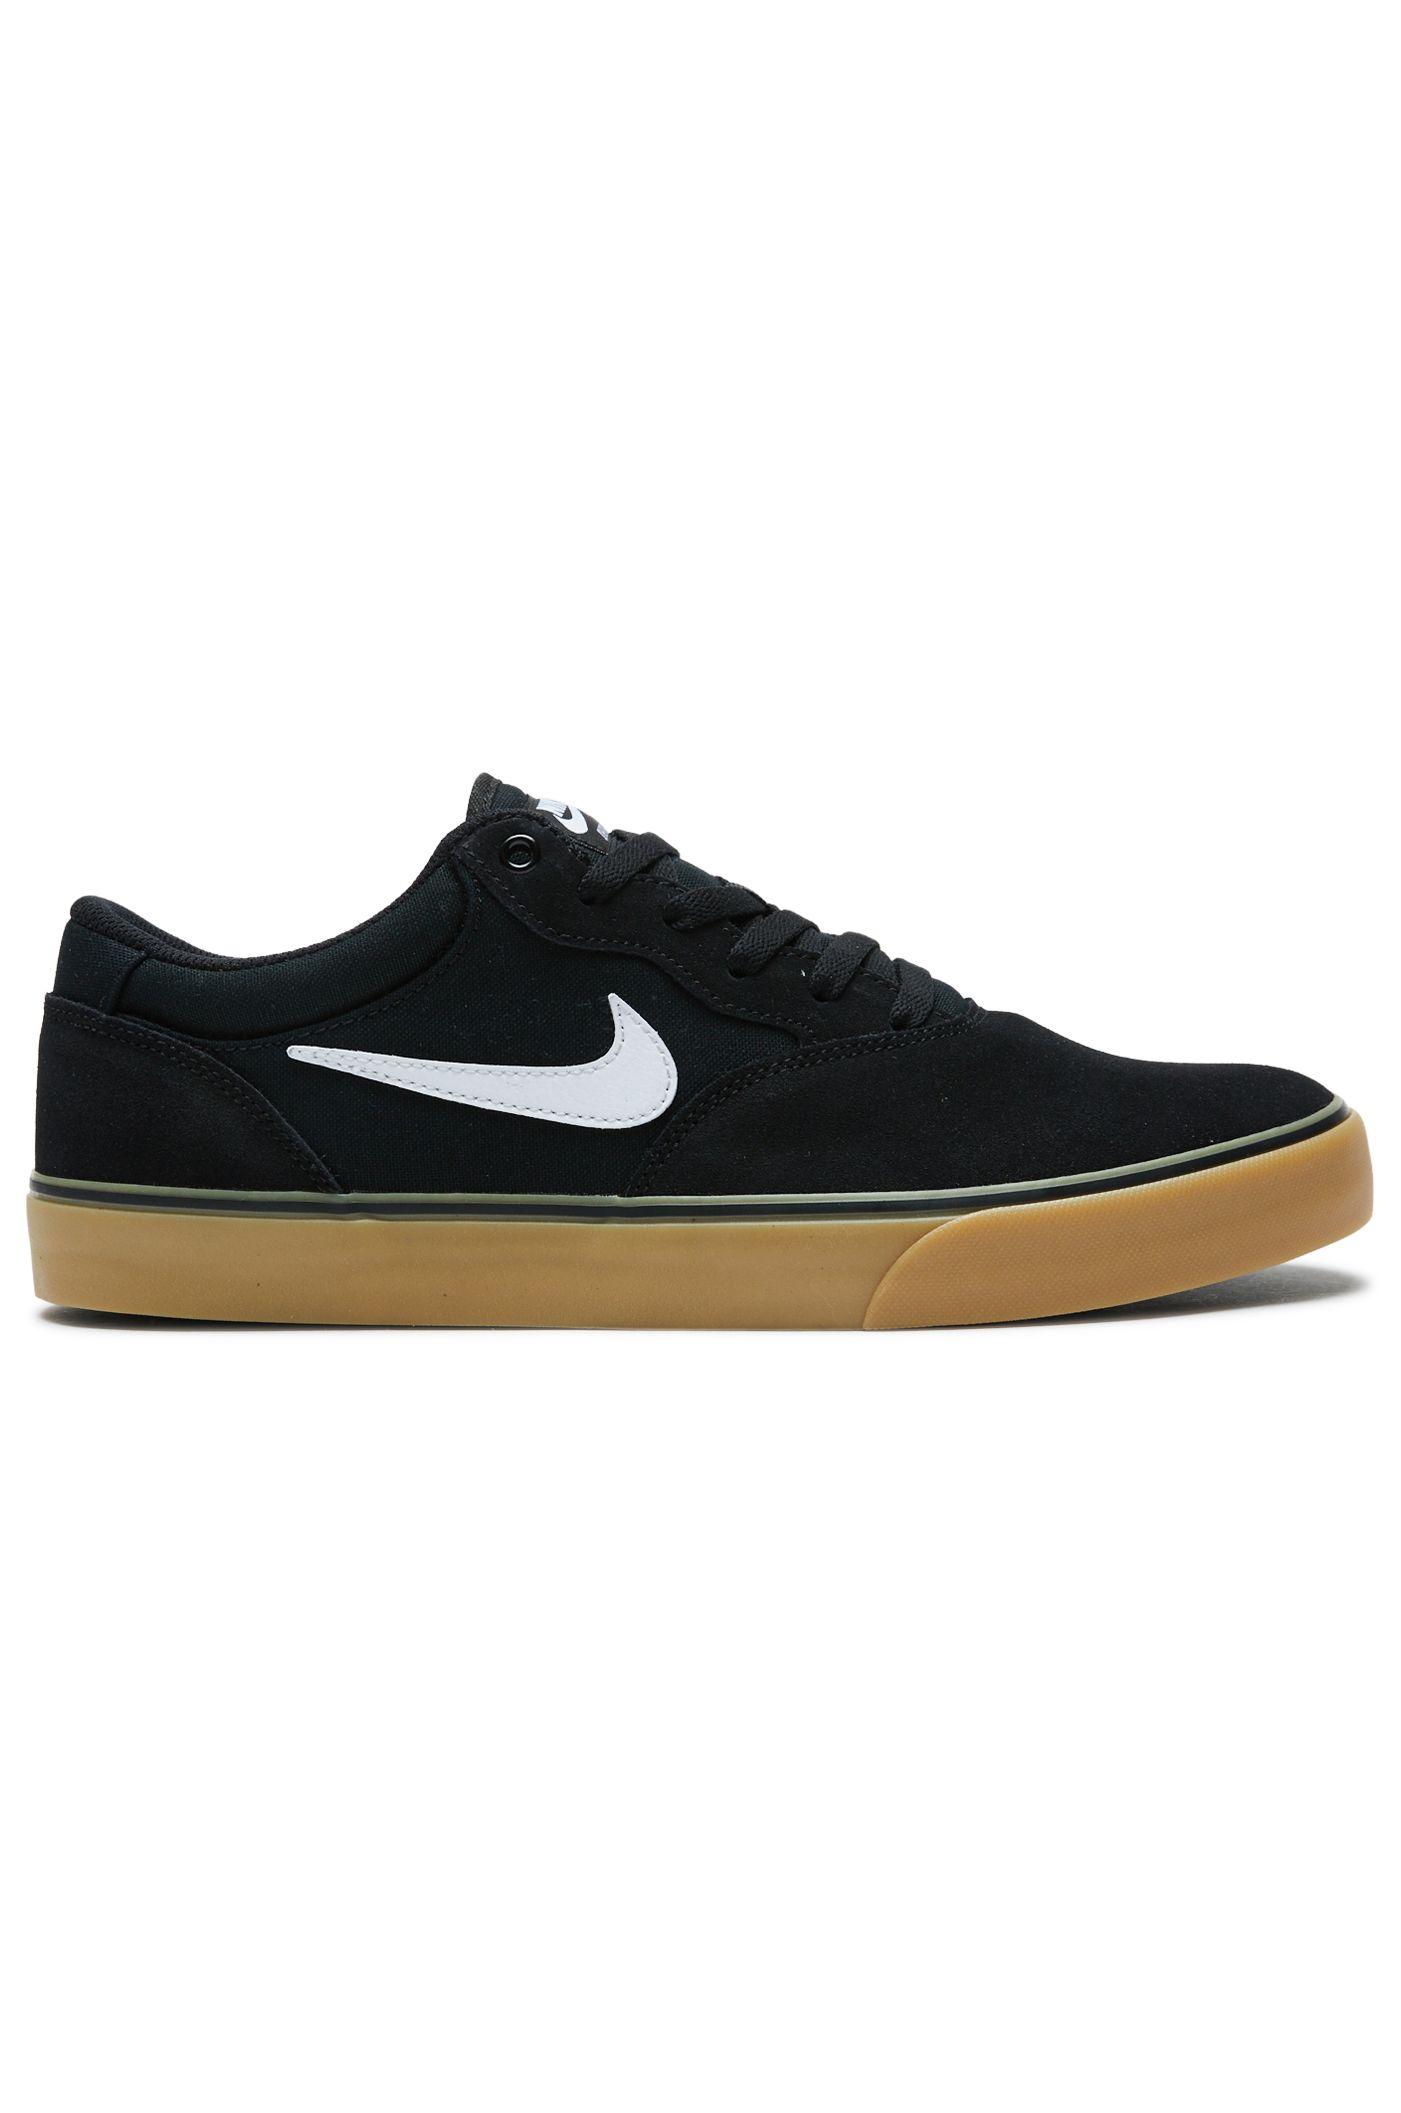 Nike Sb Shoes CHRON 2 Black/White-Black-Gum Light Brown